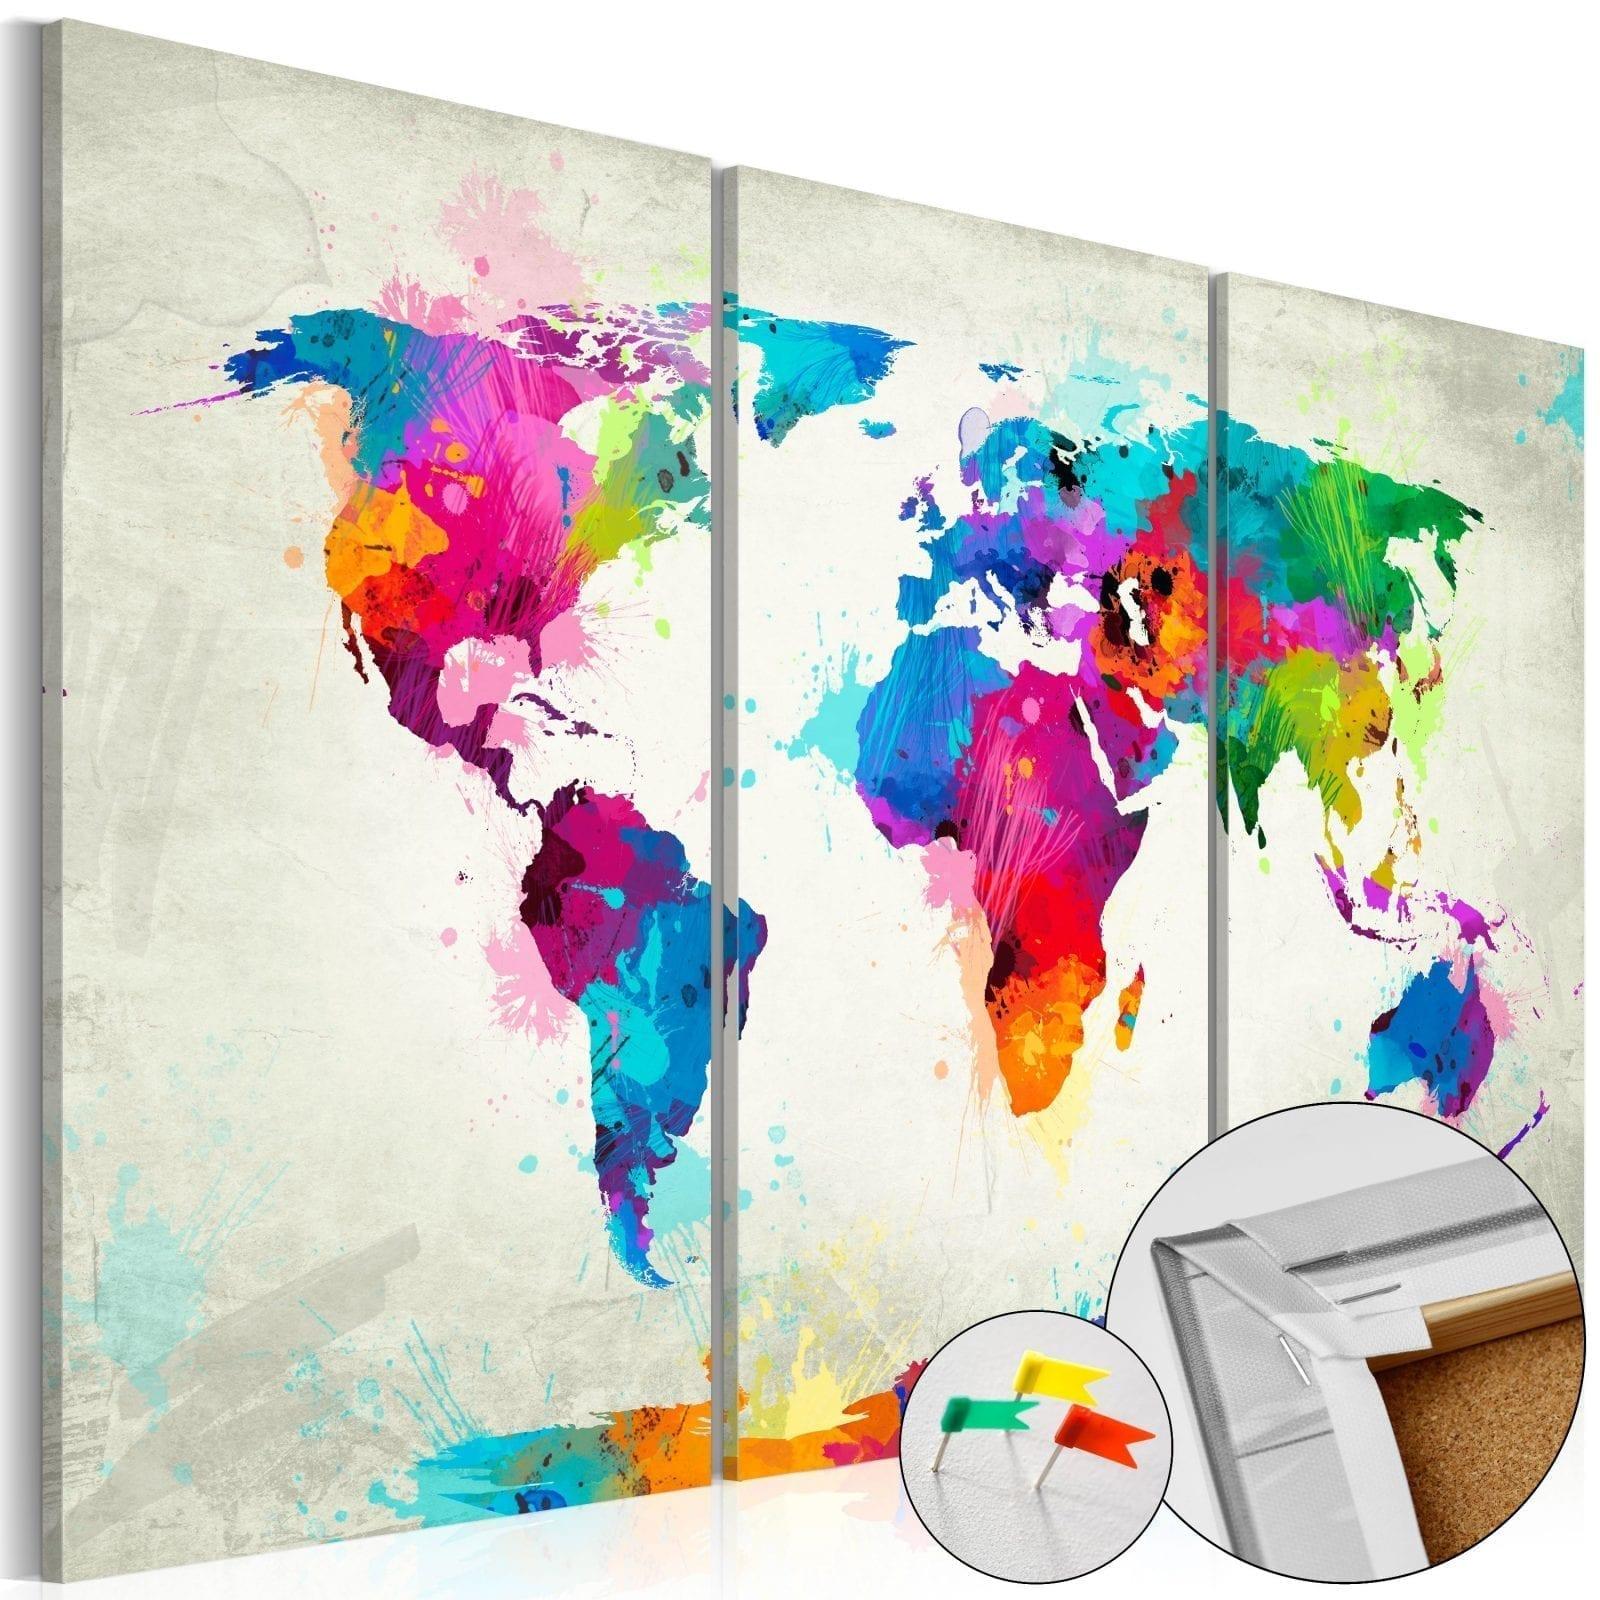 Tablero de corcho - Colourful Expression 1 | Potspintura.com